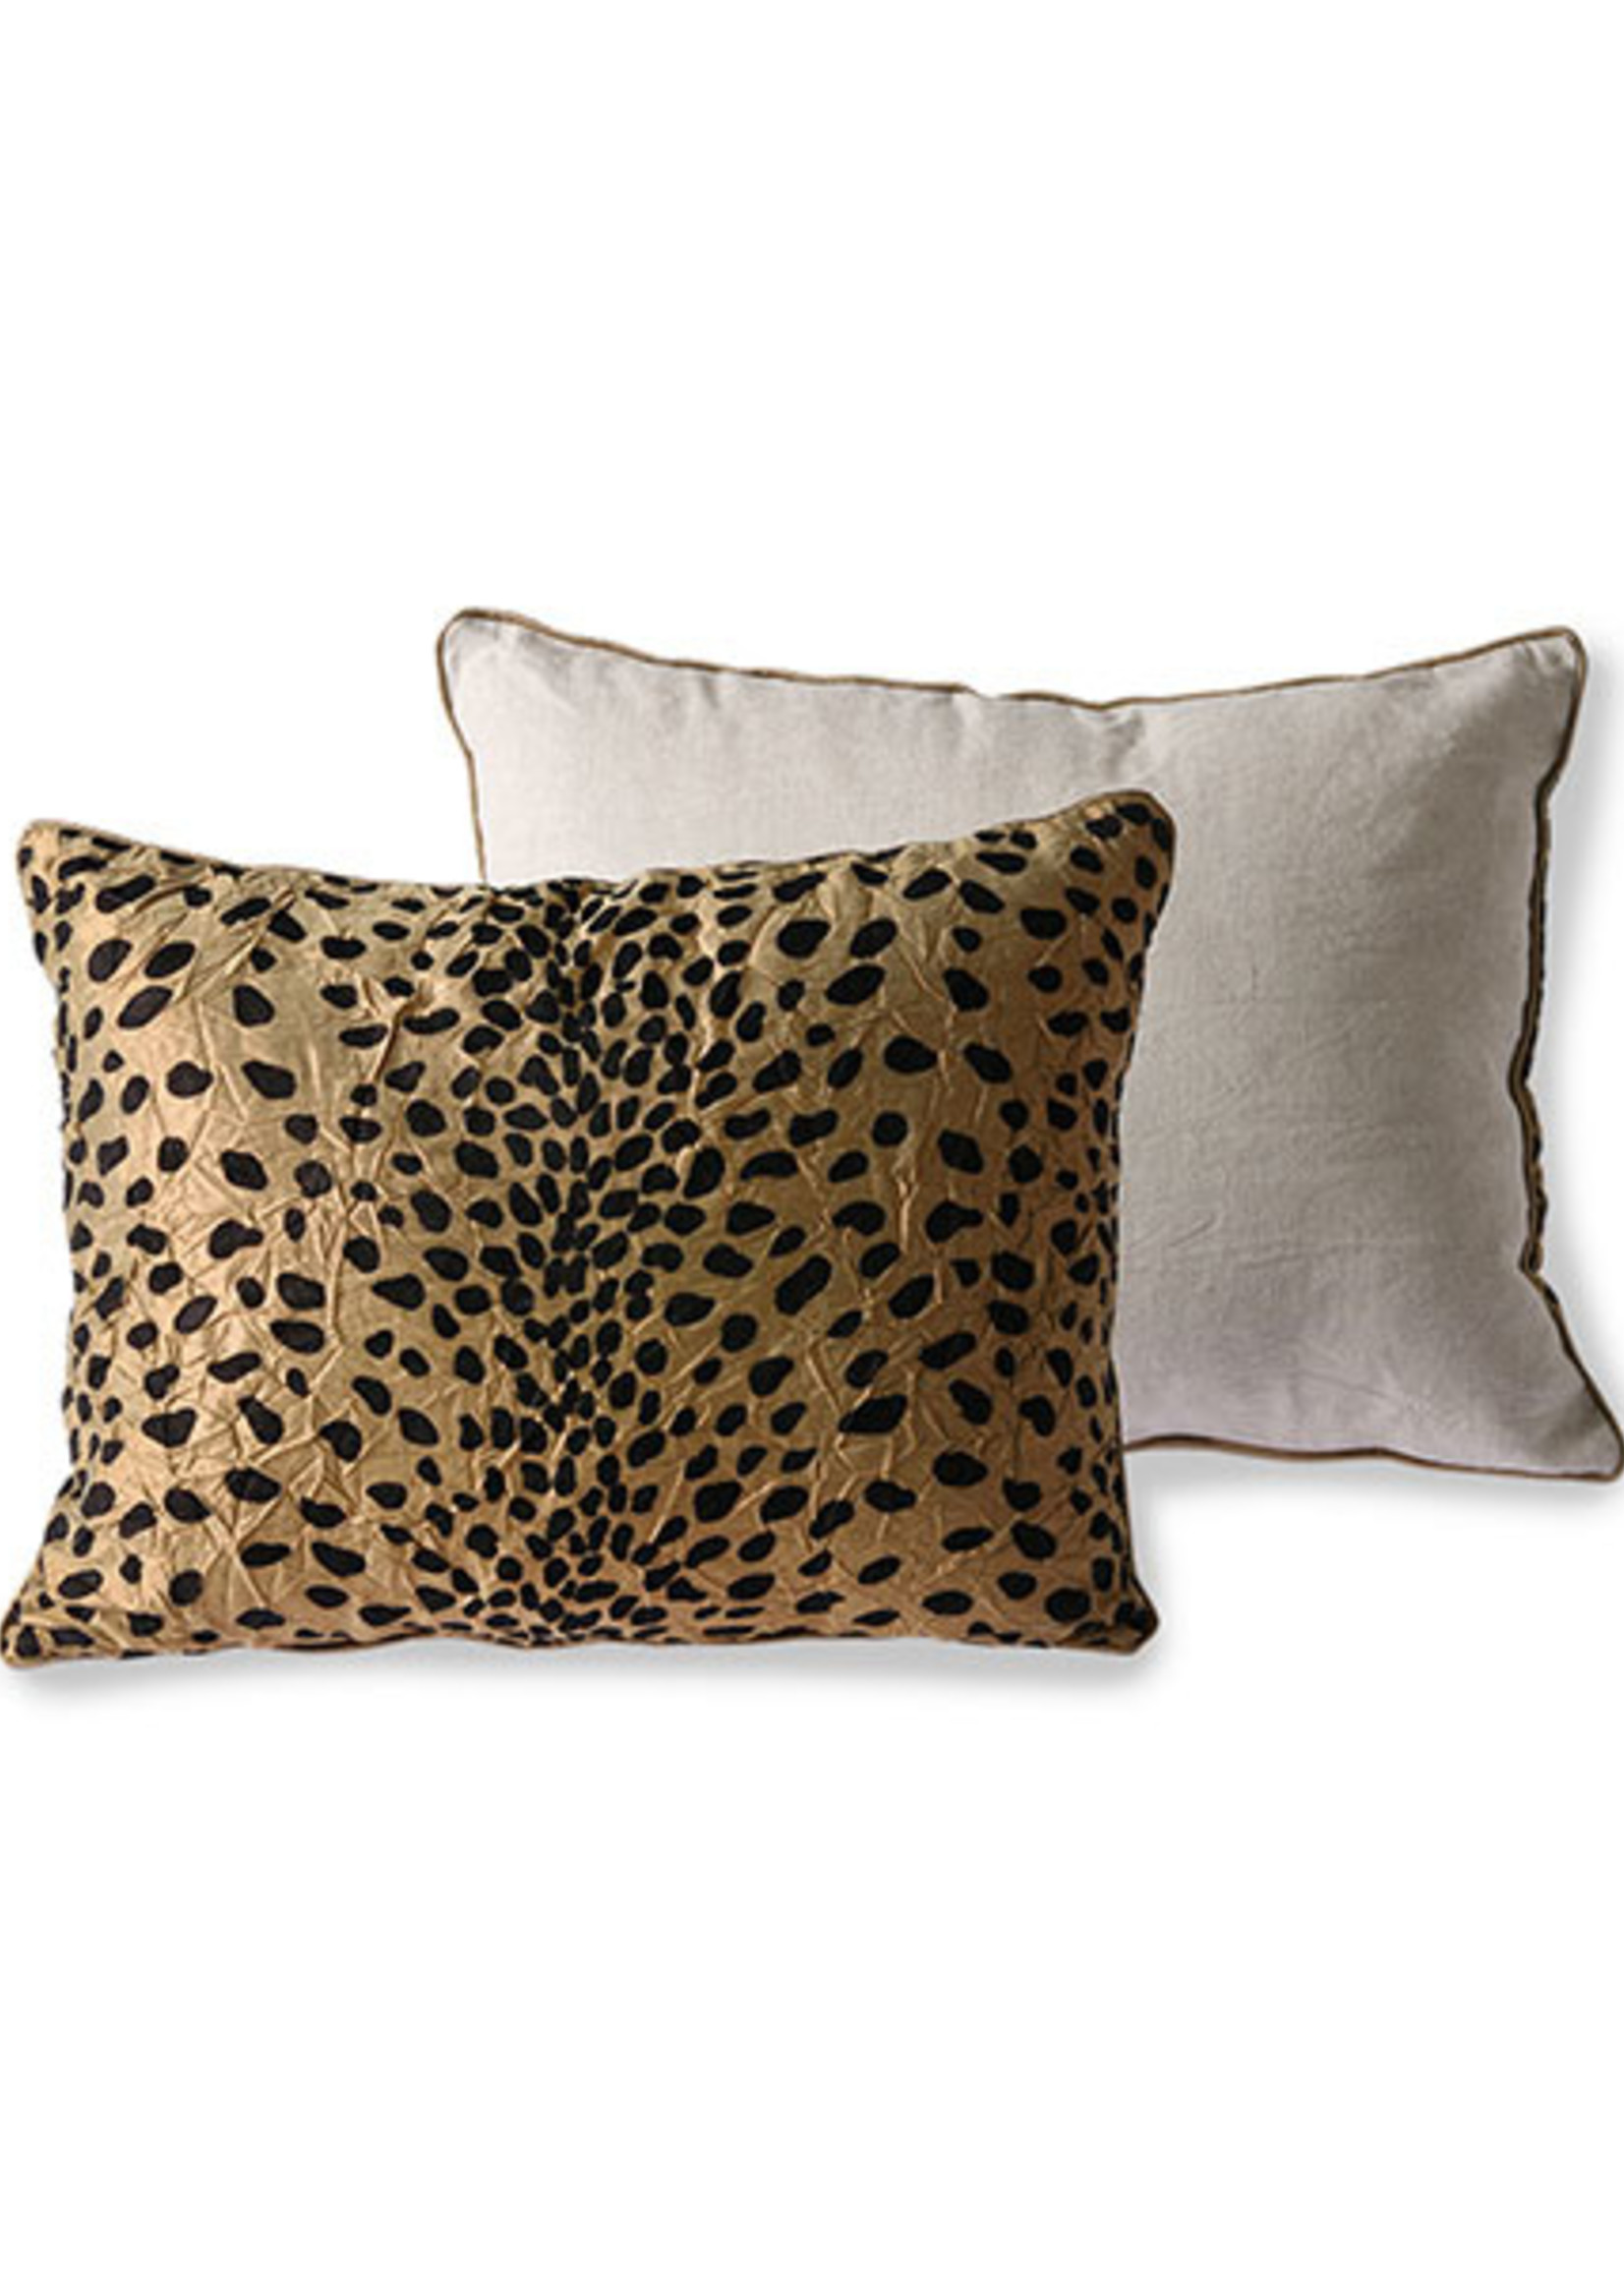 HK living DORIS for HKLIVING: cushion print panther (30x40)